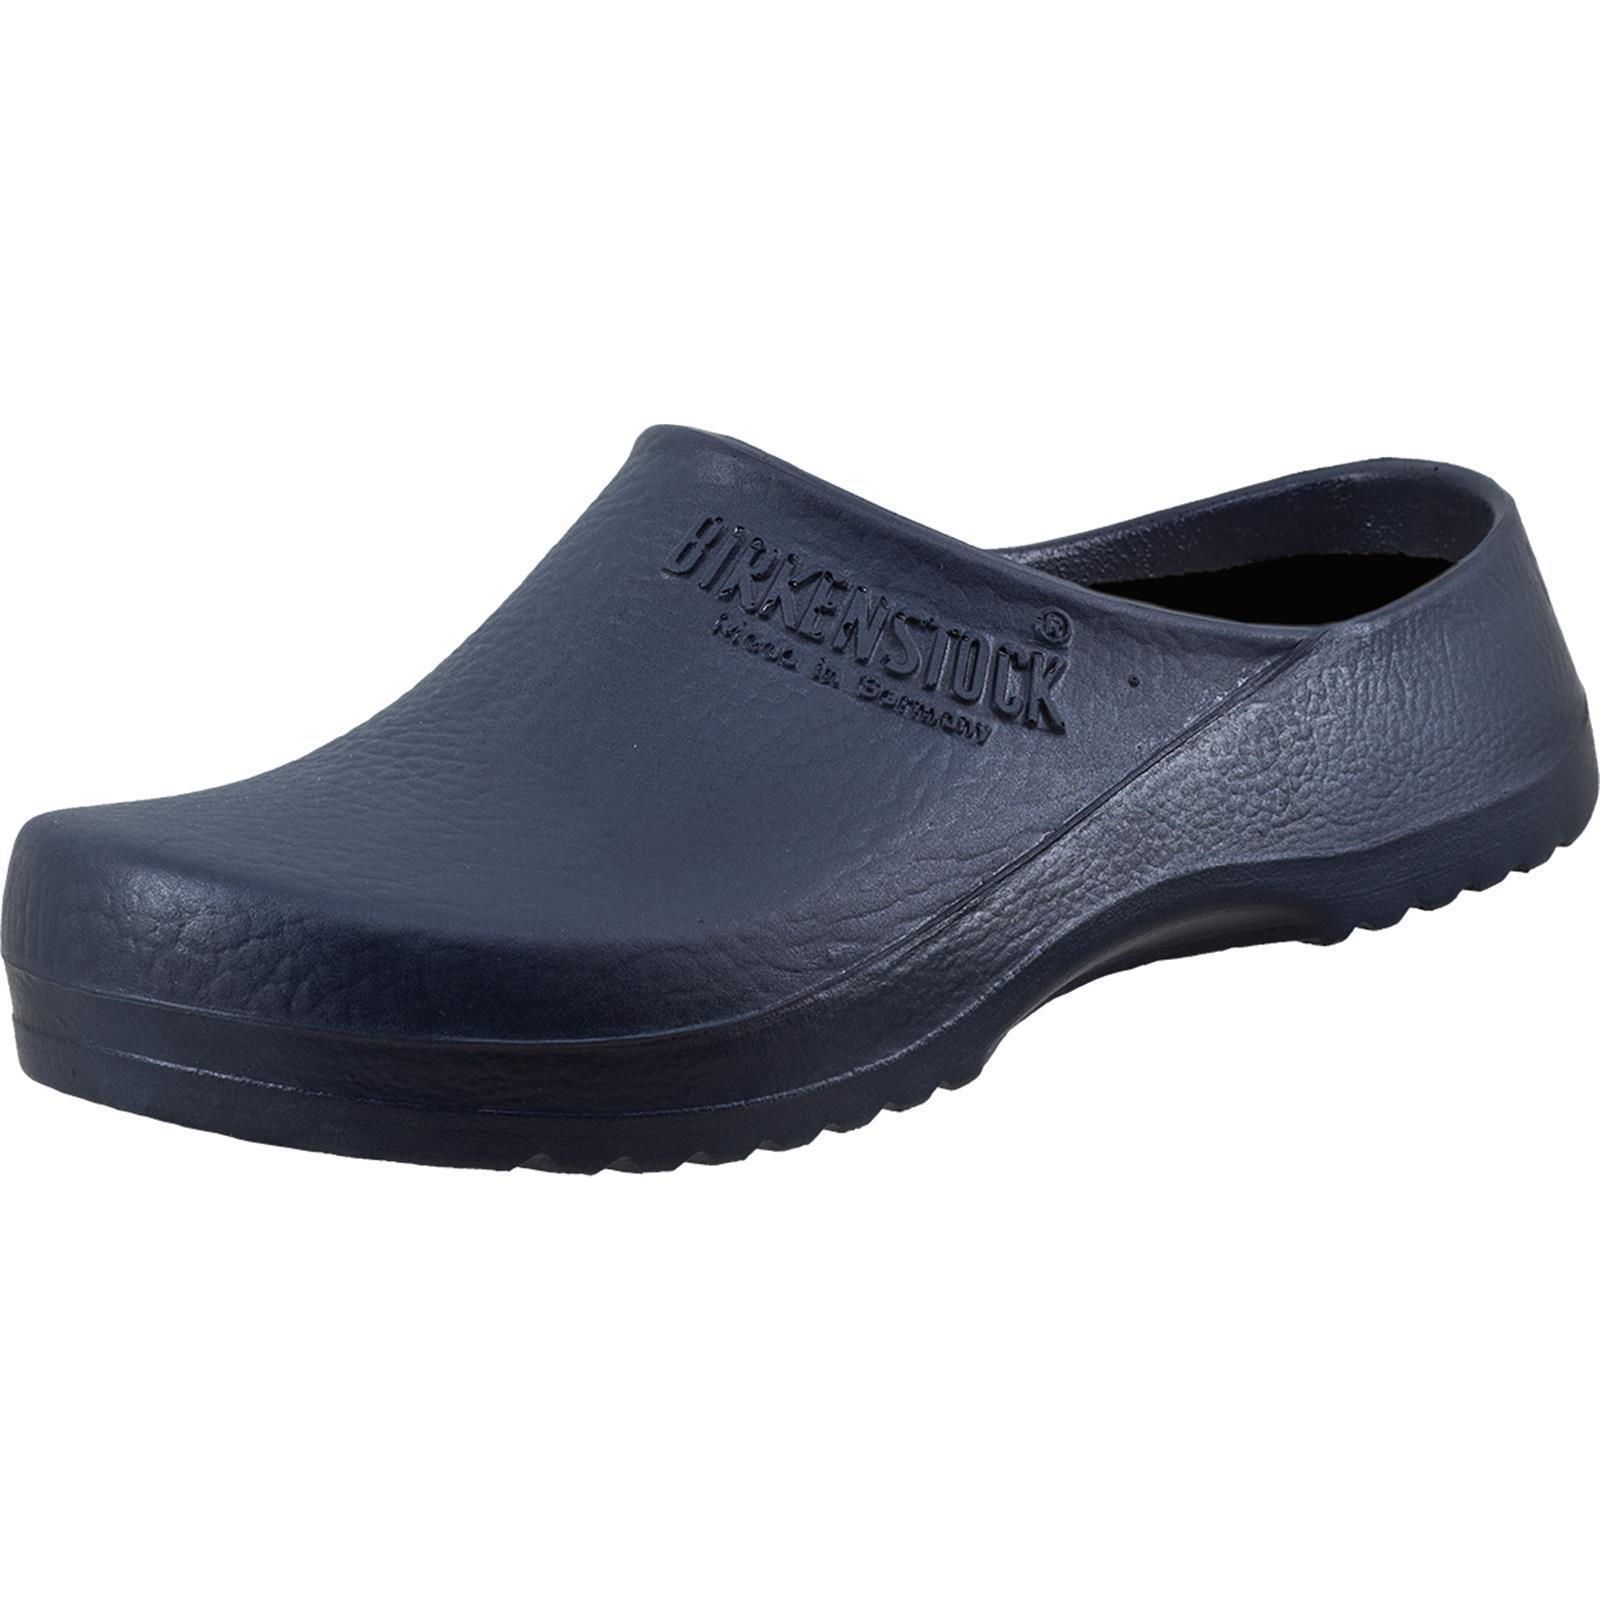 Birkenstock Super Birki Schuhe blau